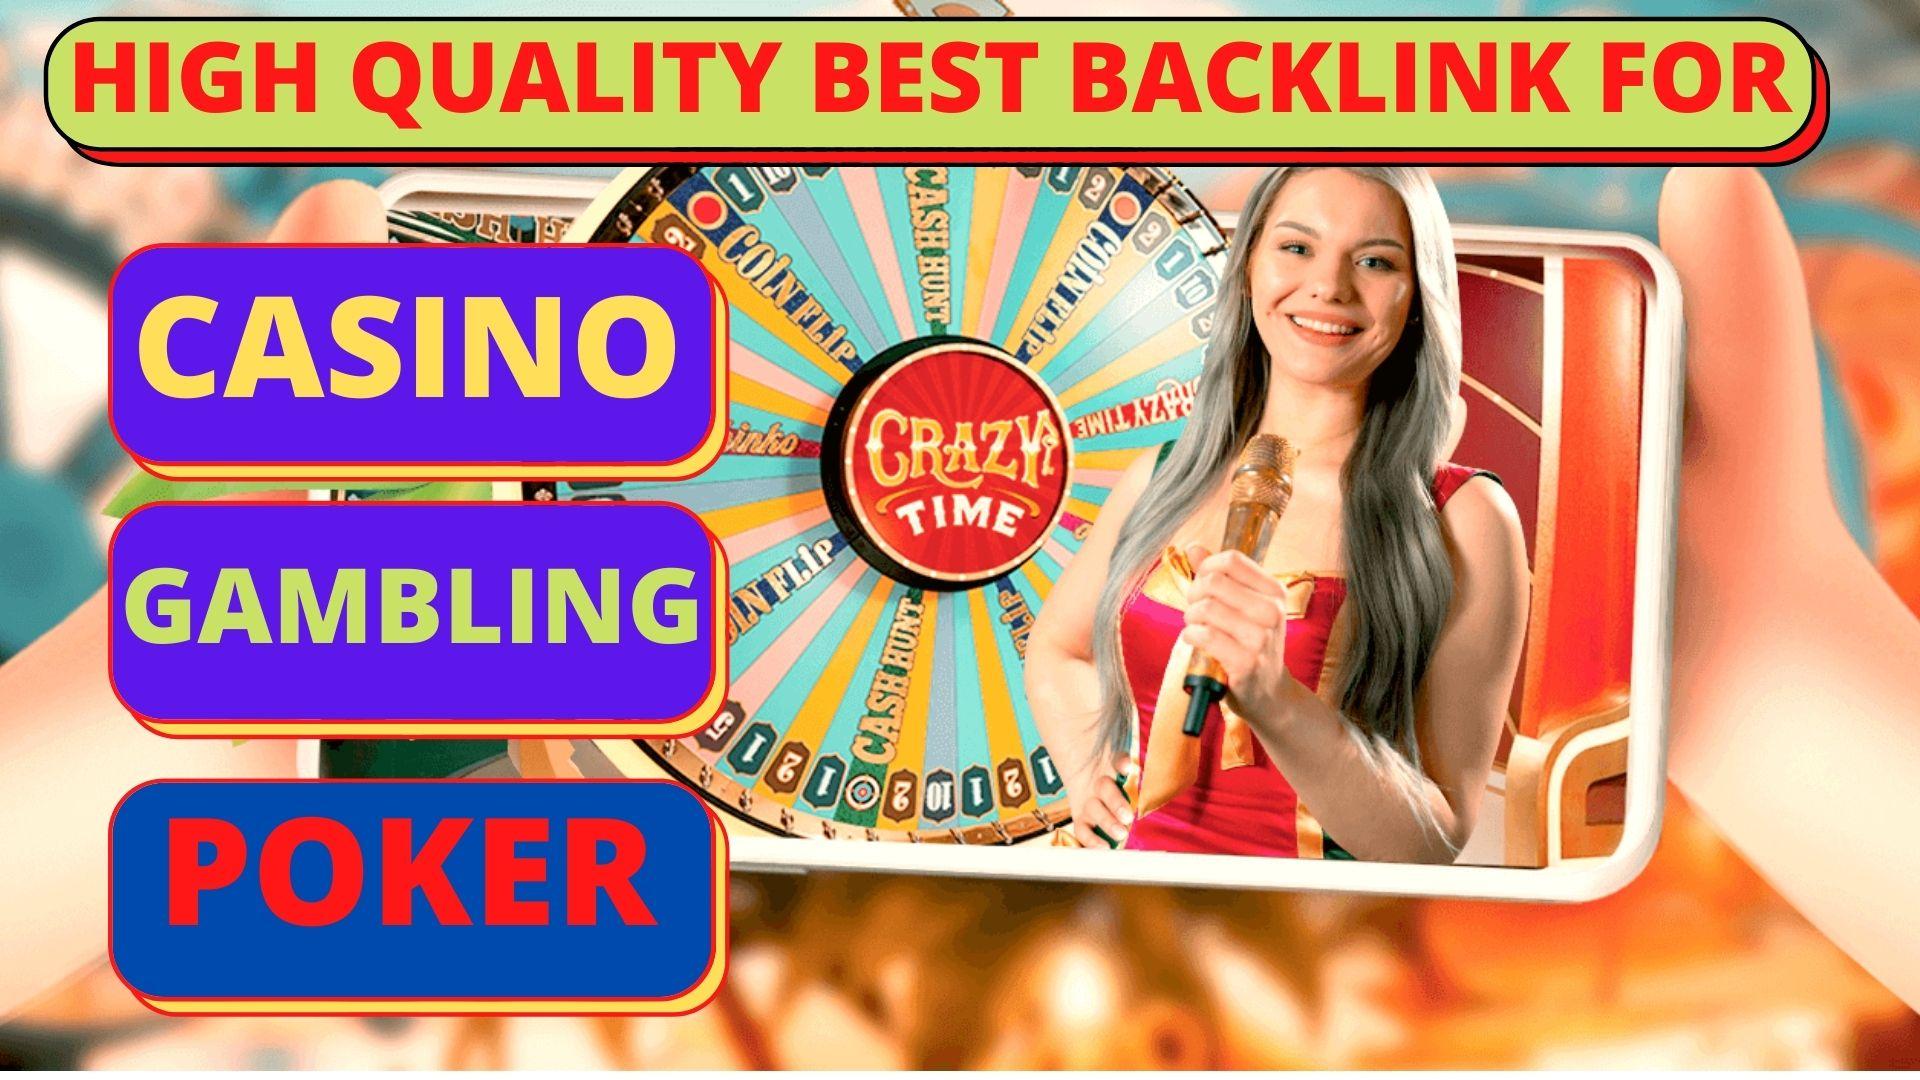 Powerful 15,000 PBN CASINO/POKER/GAMBLING/JUDI BOLA/ With Unique Domain PBN backlinks